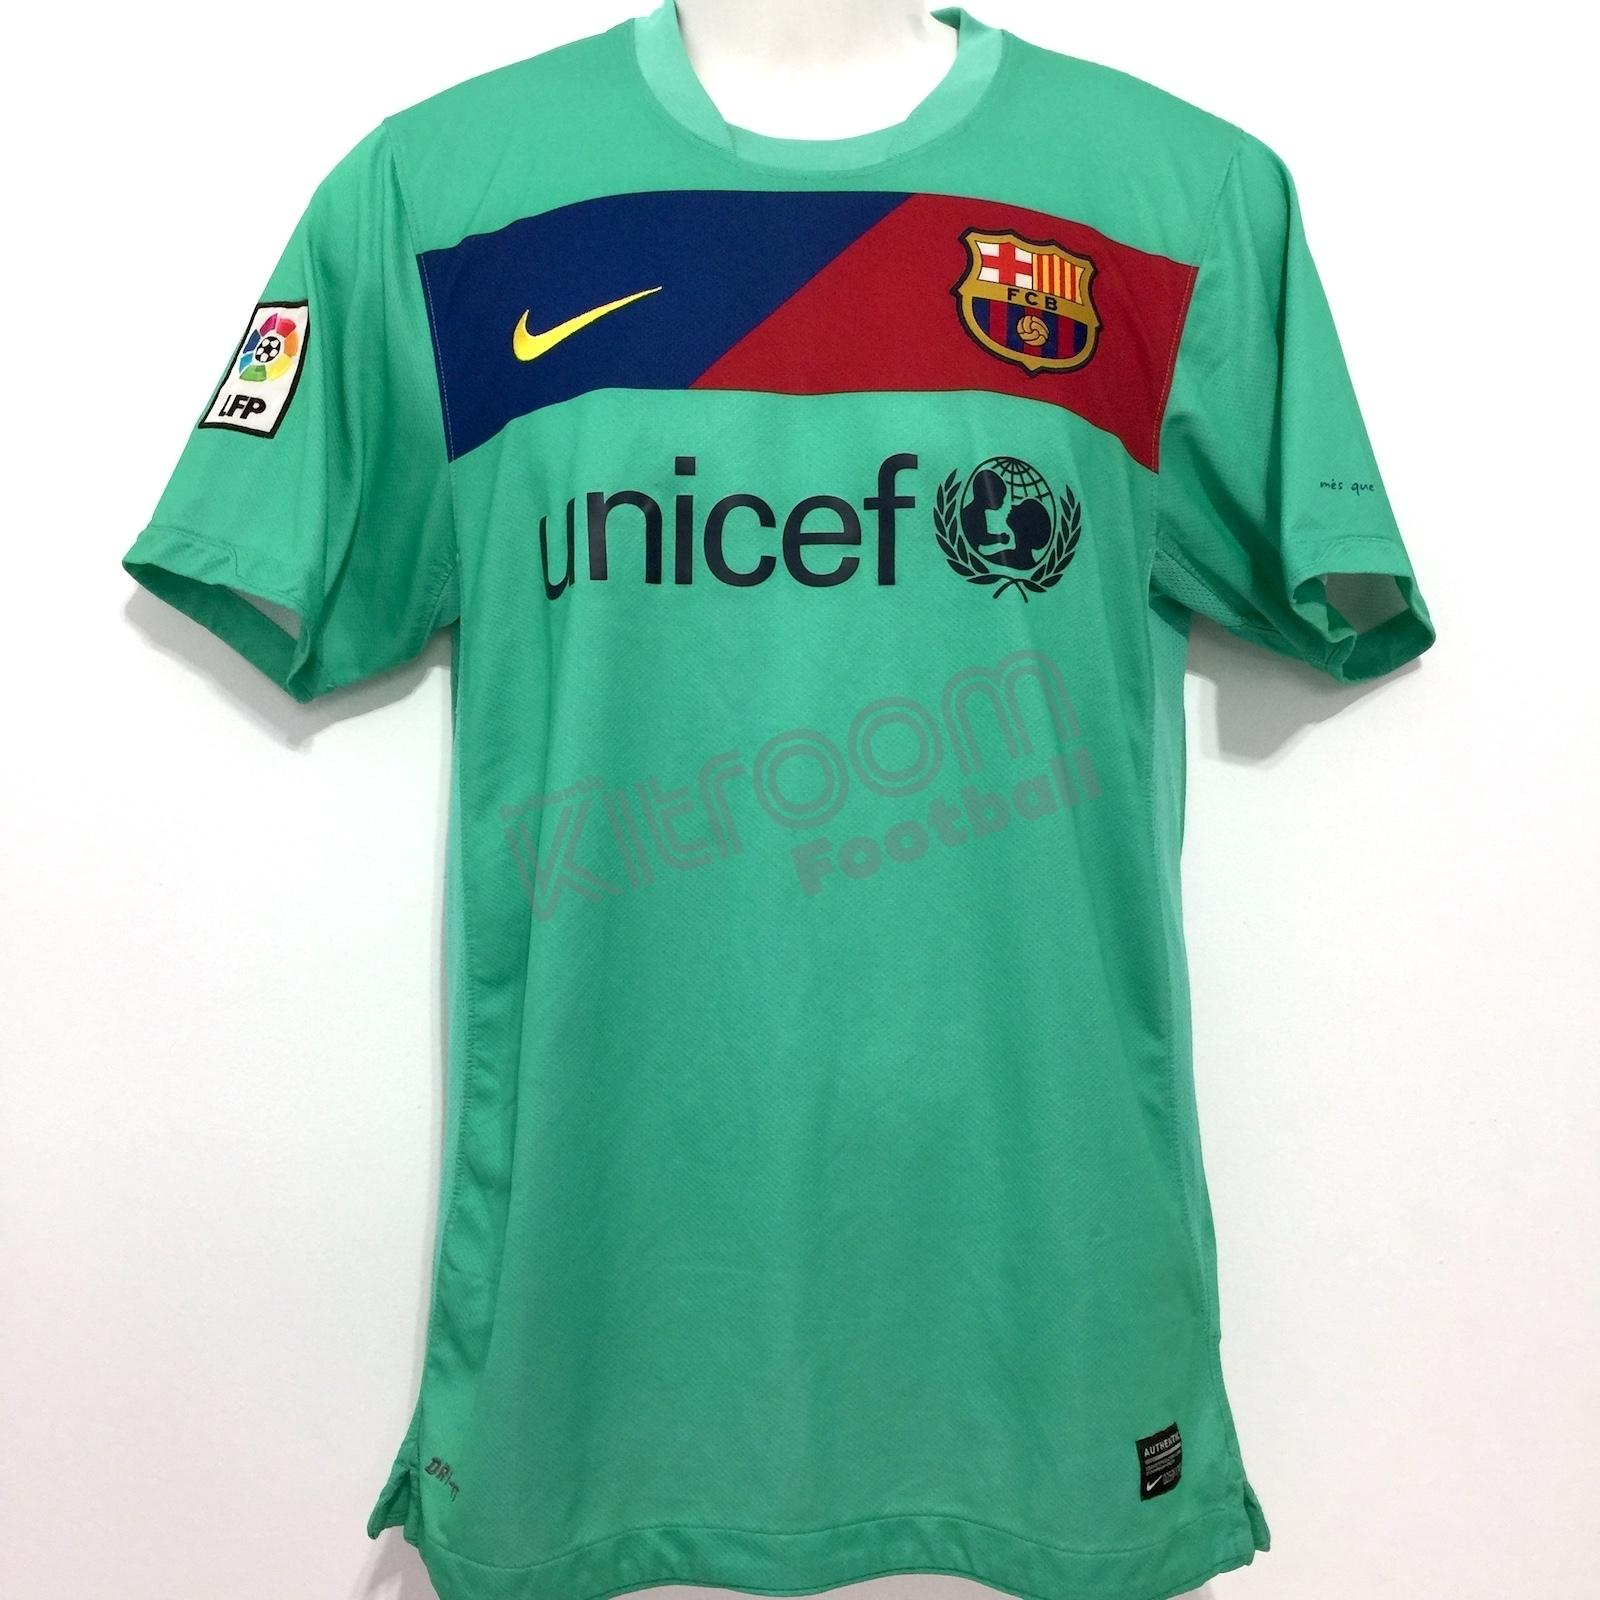 ff5c96d9a 2010-11 Barcelona Away Shirt David Villa  7 Nike (Very Good) S.  FCB10ASSS-VG-7DV%20(1).JPG. FCB10ASSS-VG-7DV%20(2).JPG